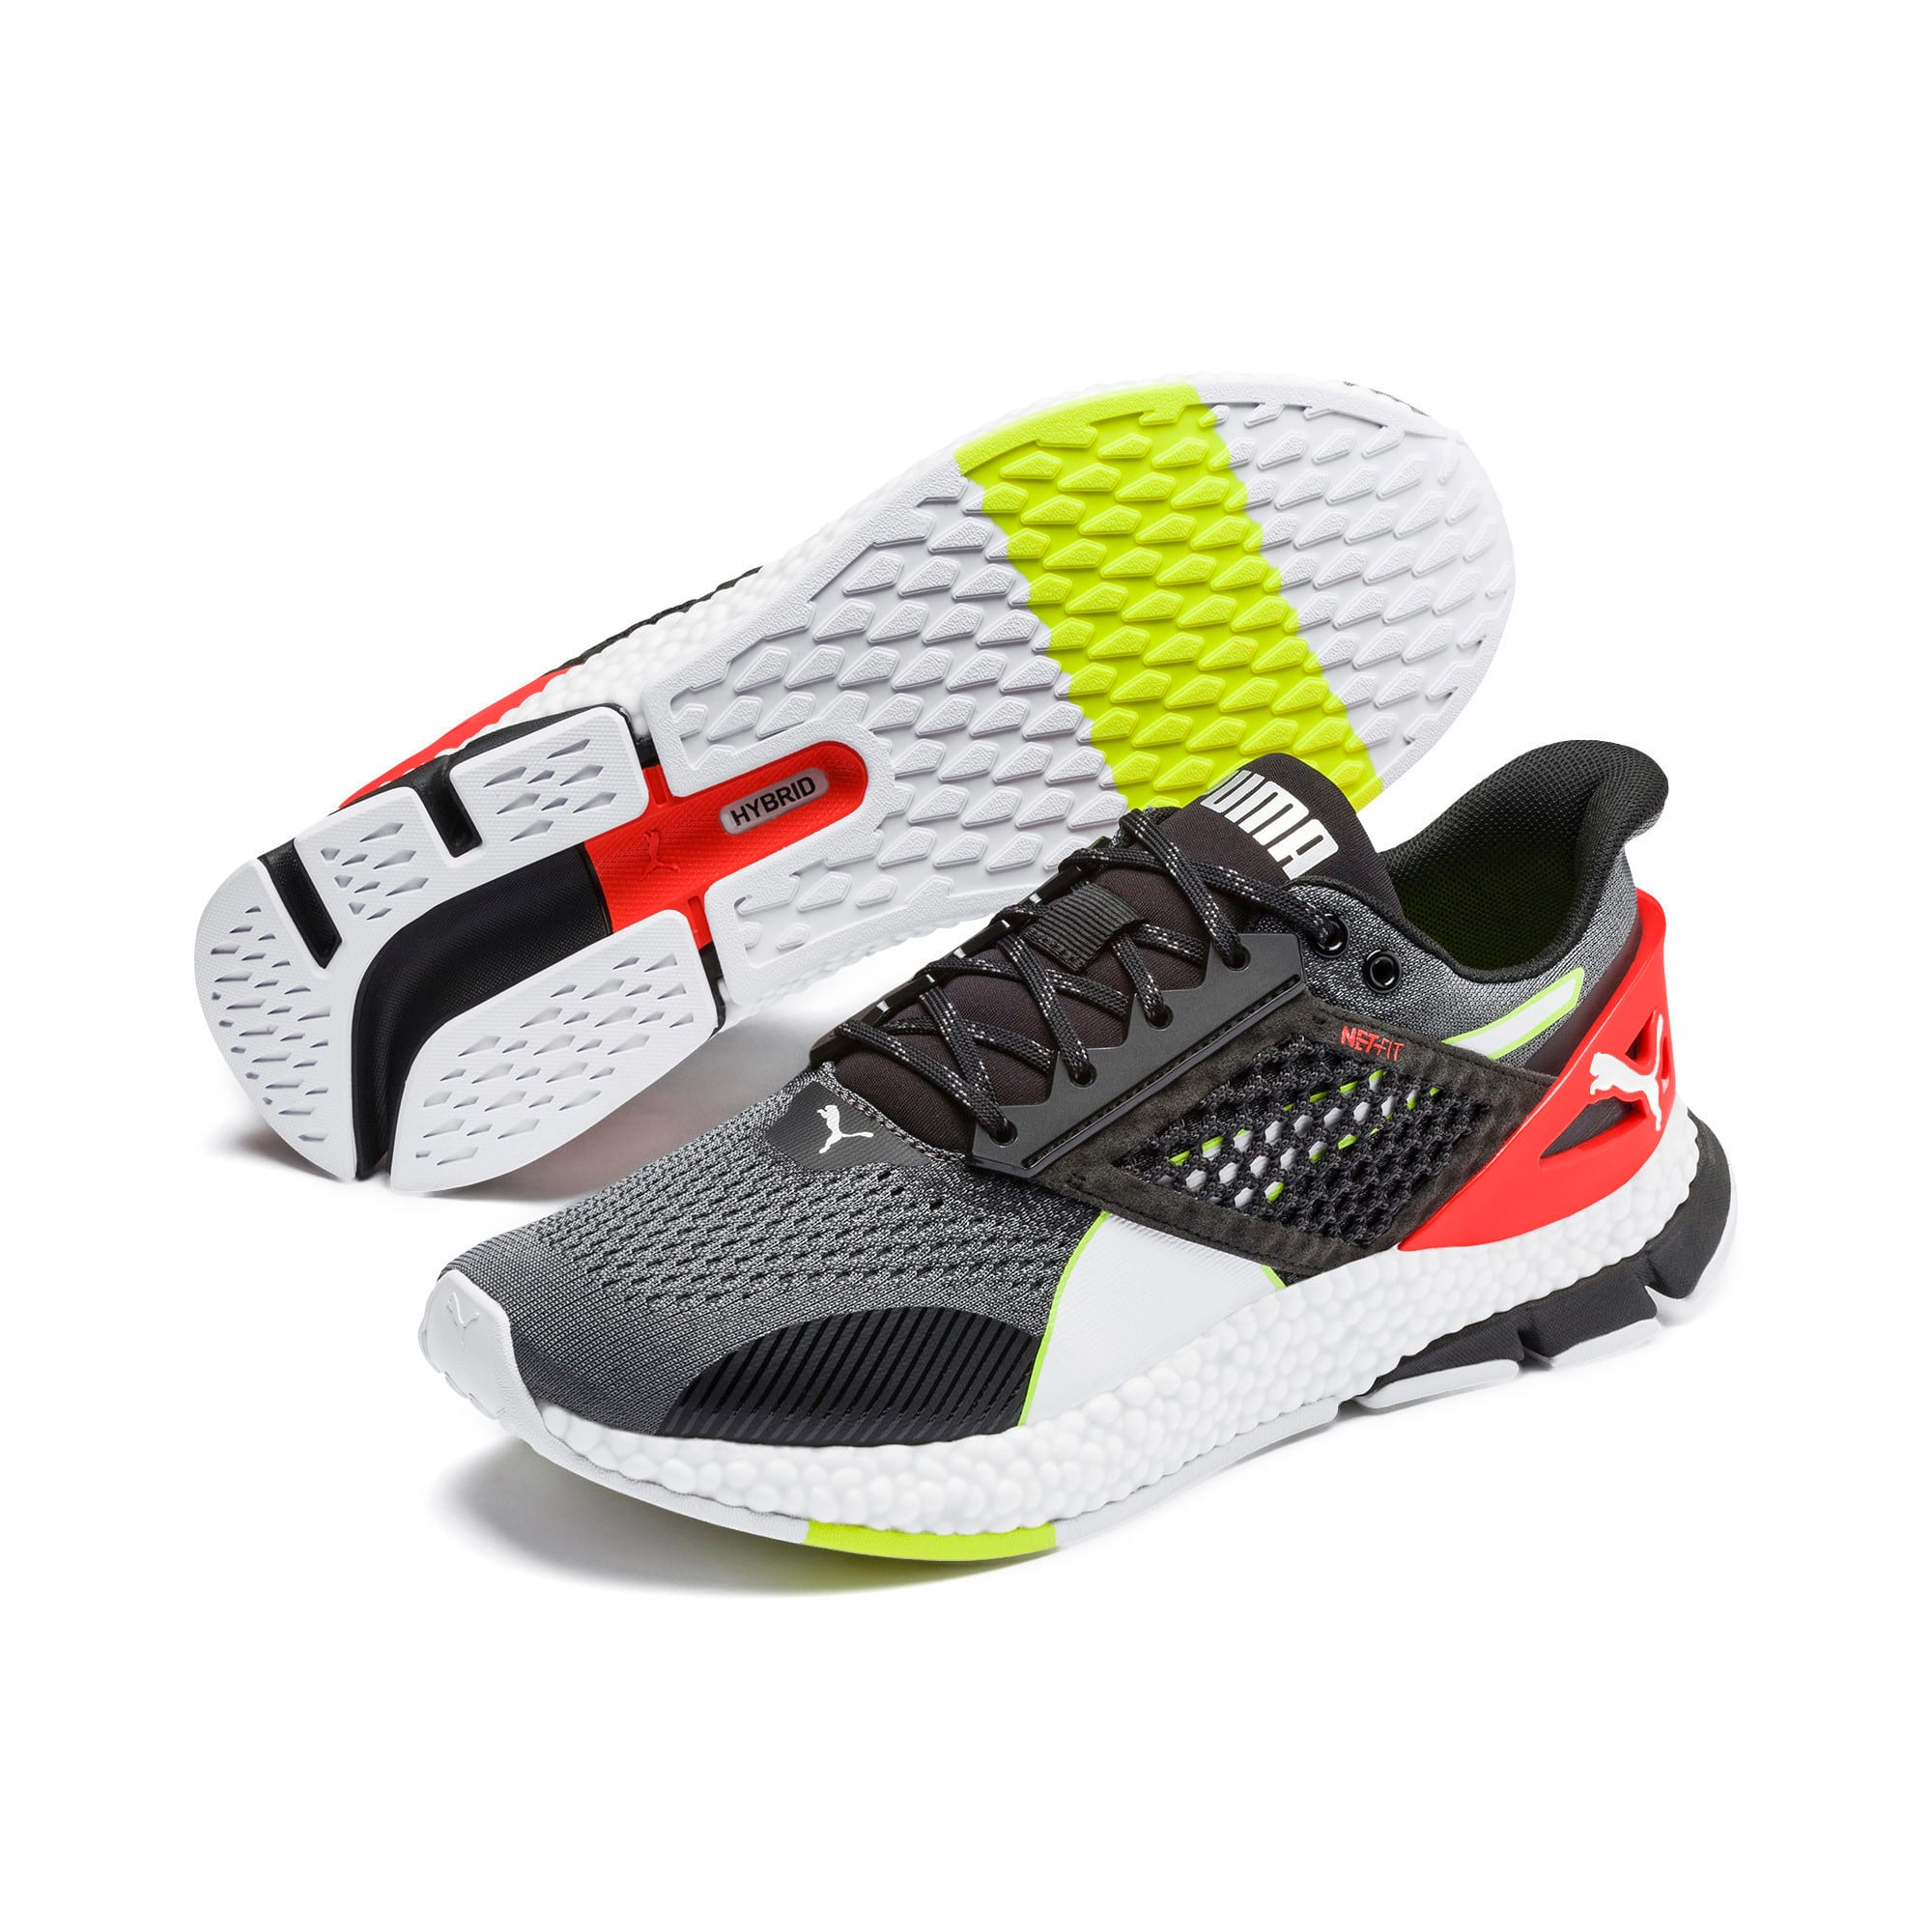 Thumbnail 9 of HYBRID NETFIT Astro Men's Running Shoes, CASTLEROCK-Puma Blck-Ngy Red, medium-IND